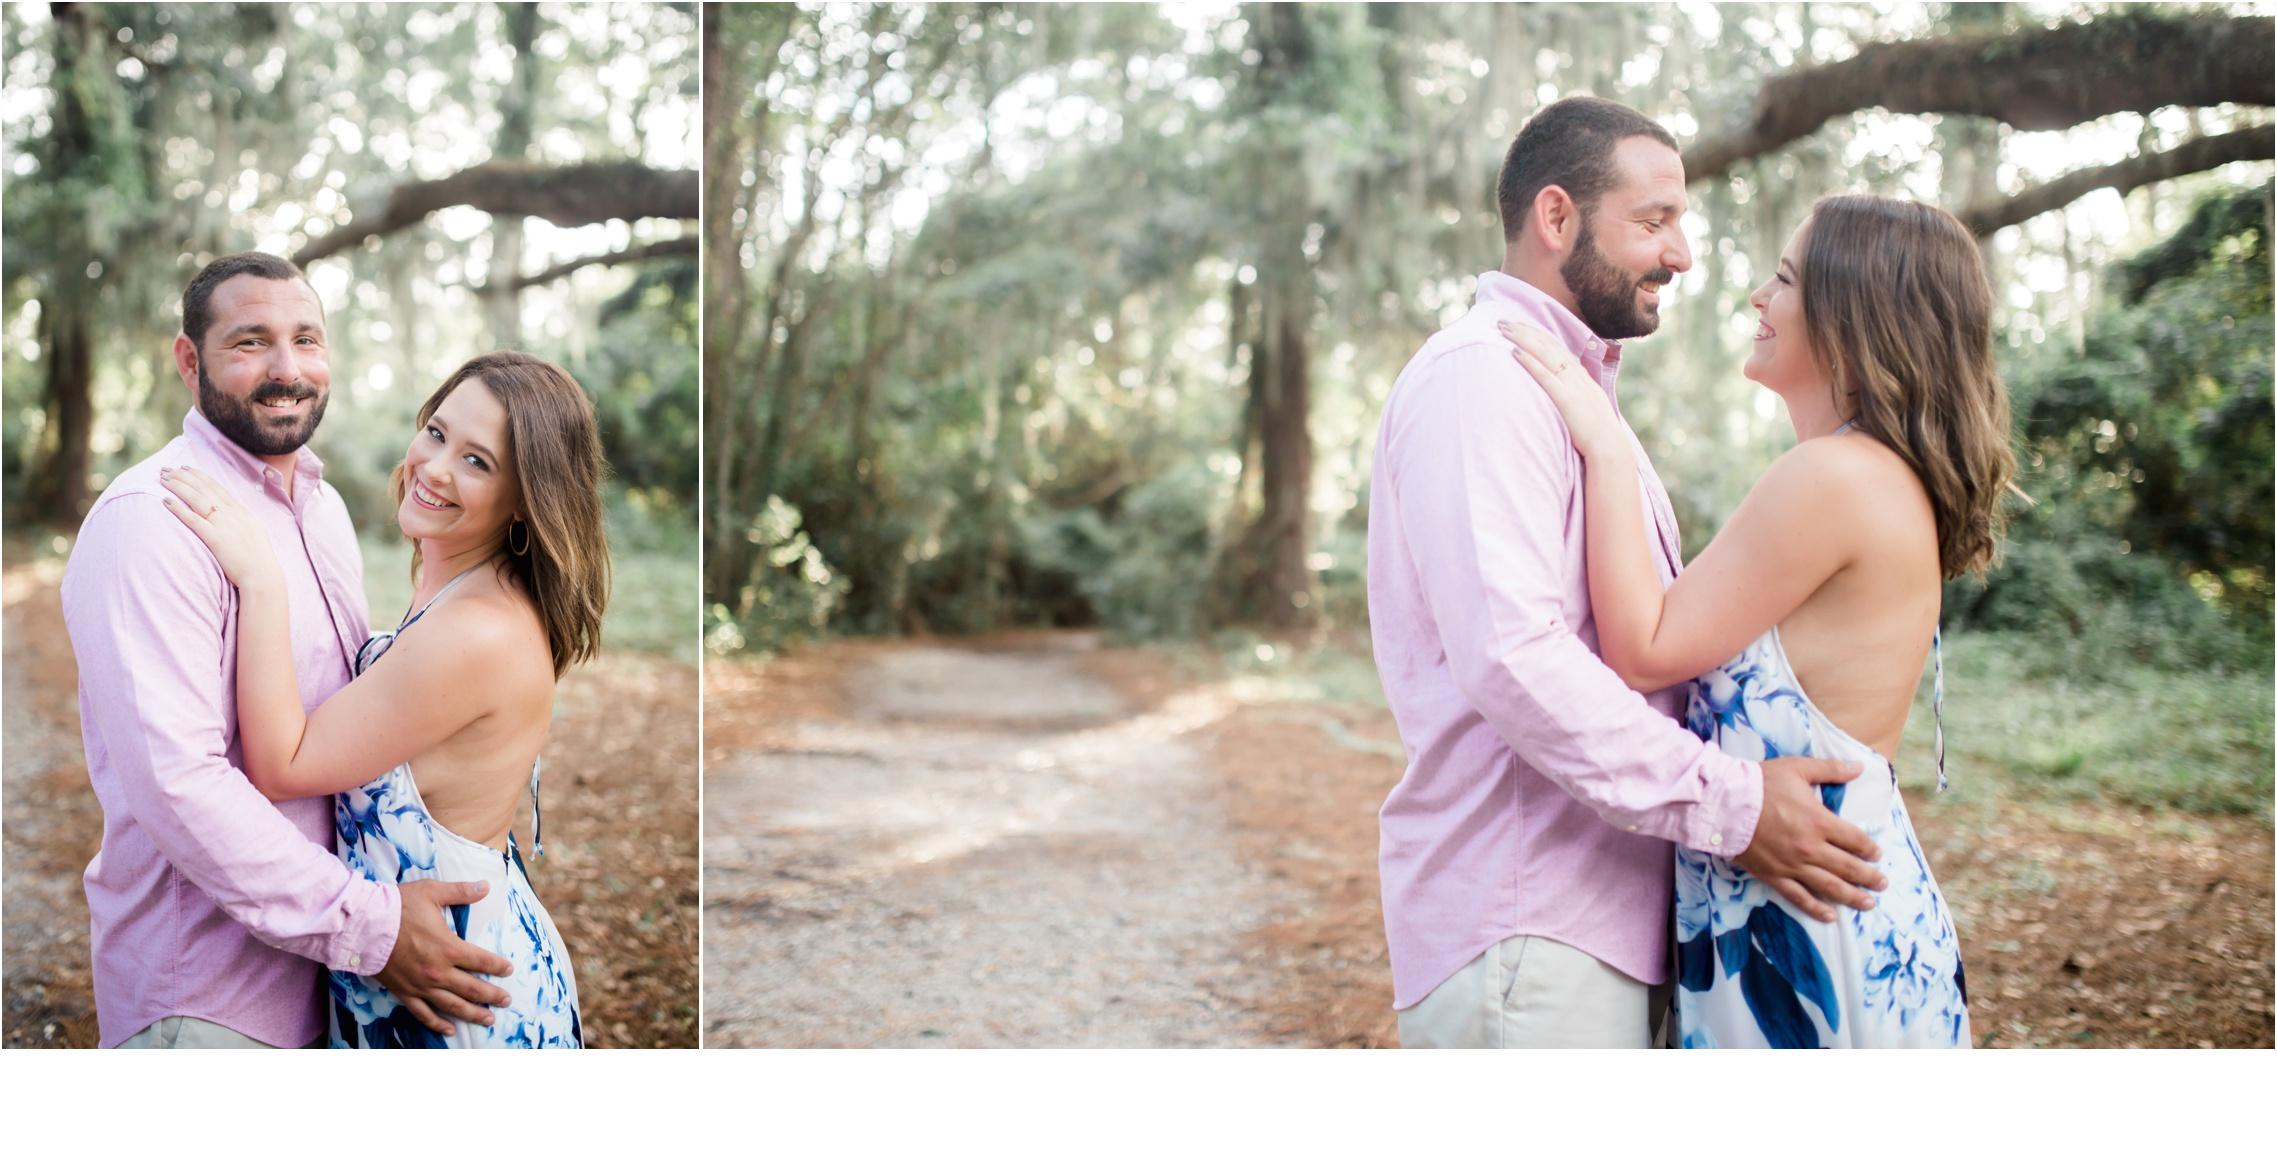 Rainey_Gregg_Photography_St._Simons_Island_Georgia_California_Wedding_Portrait_Photography_0141.jpg